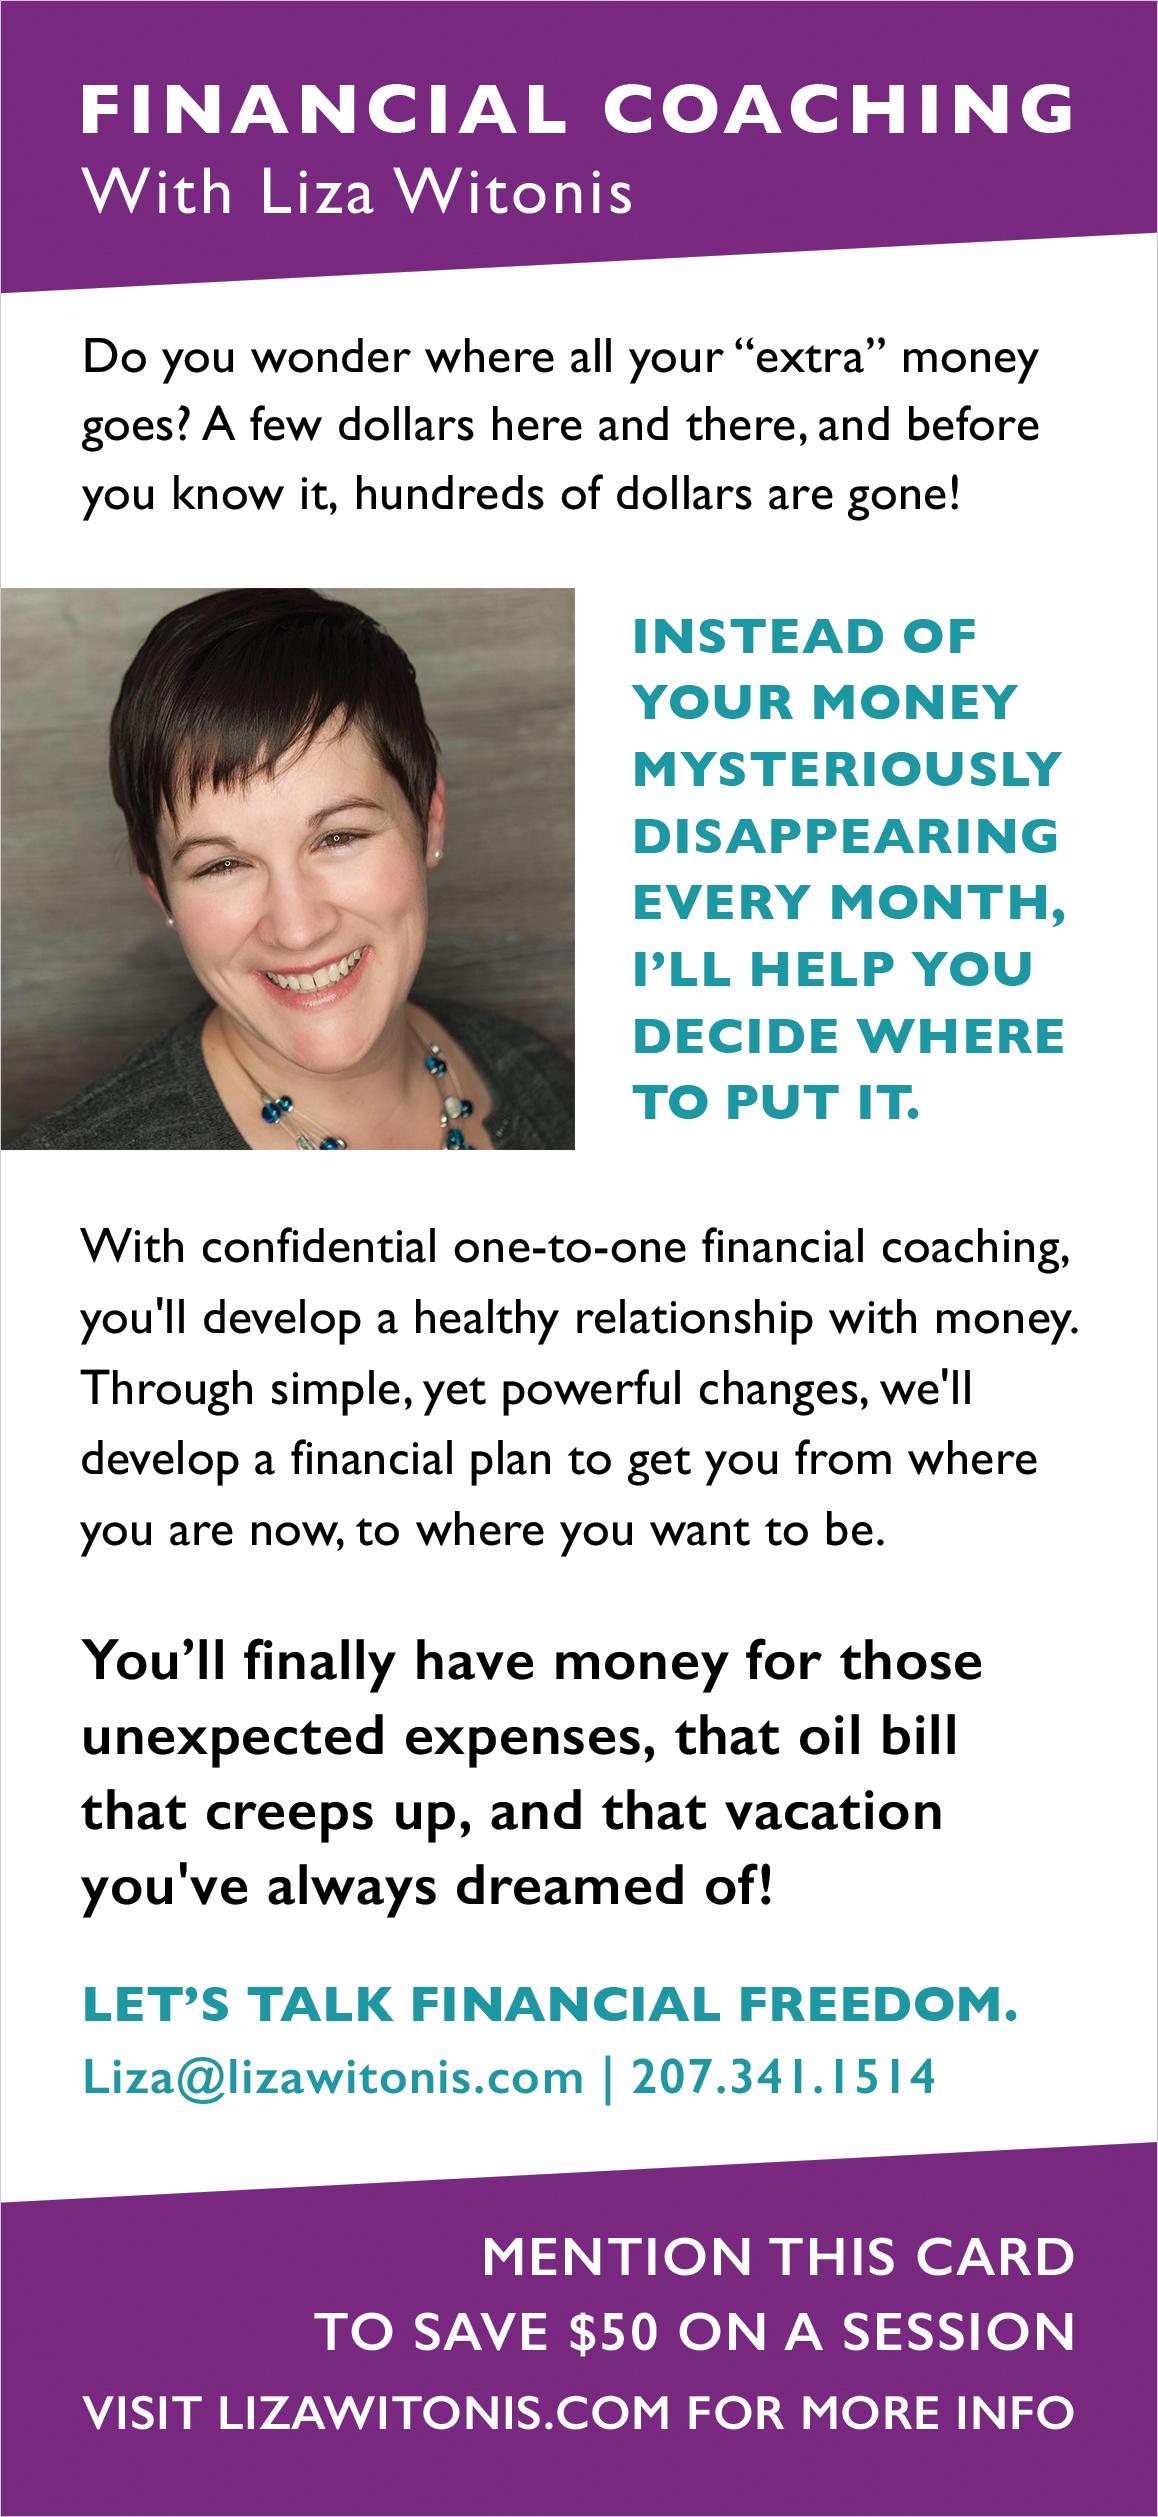 graphic design rack card promotional marketing materials money mindset coach